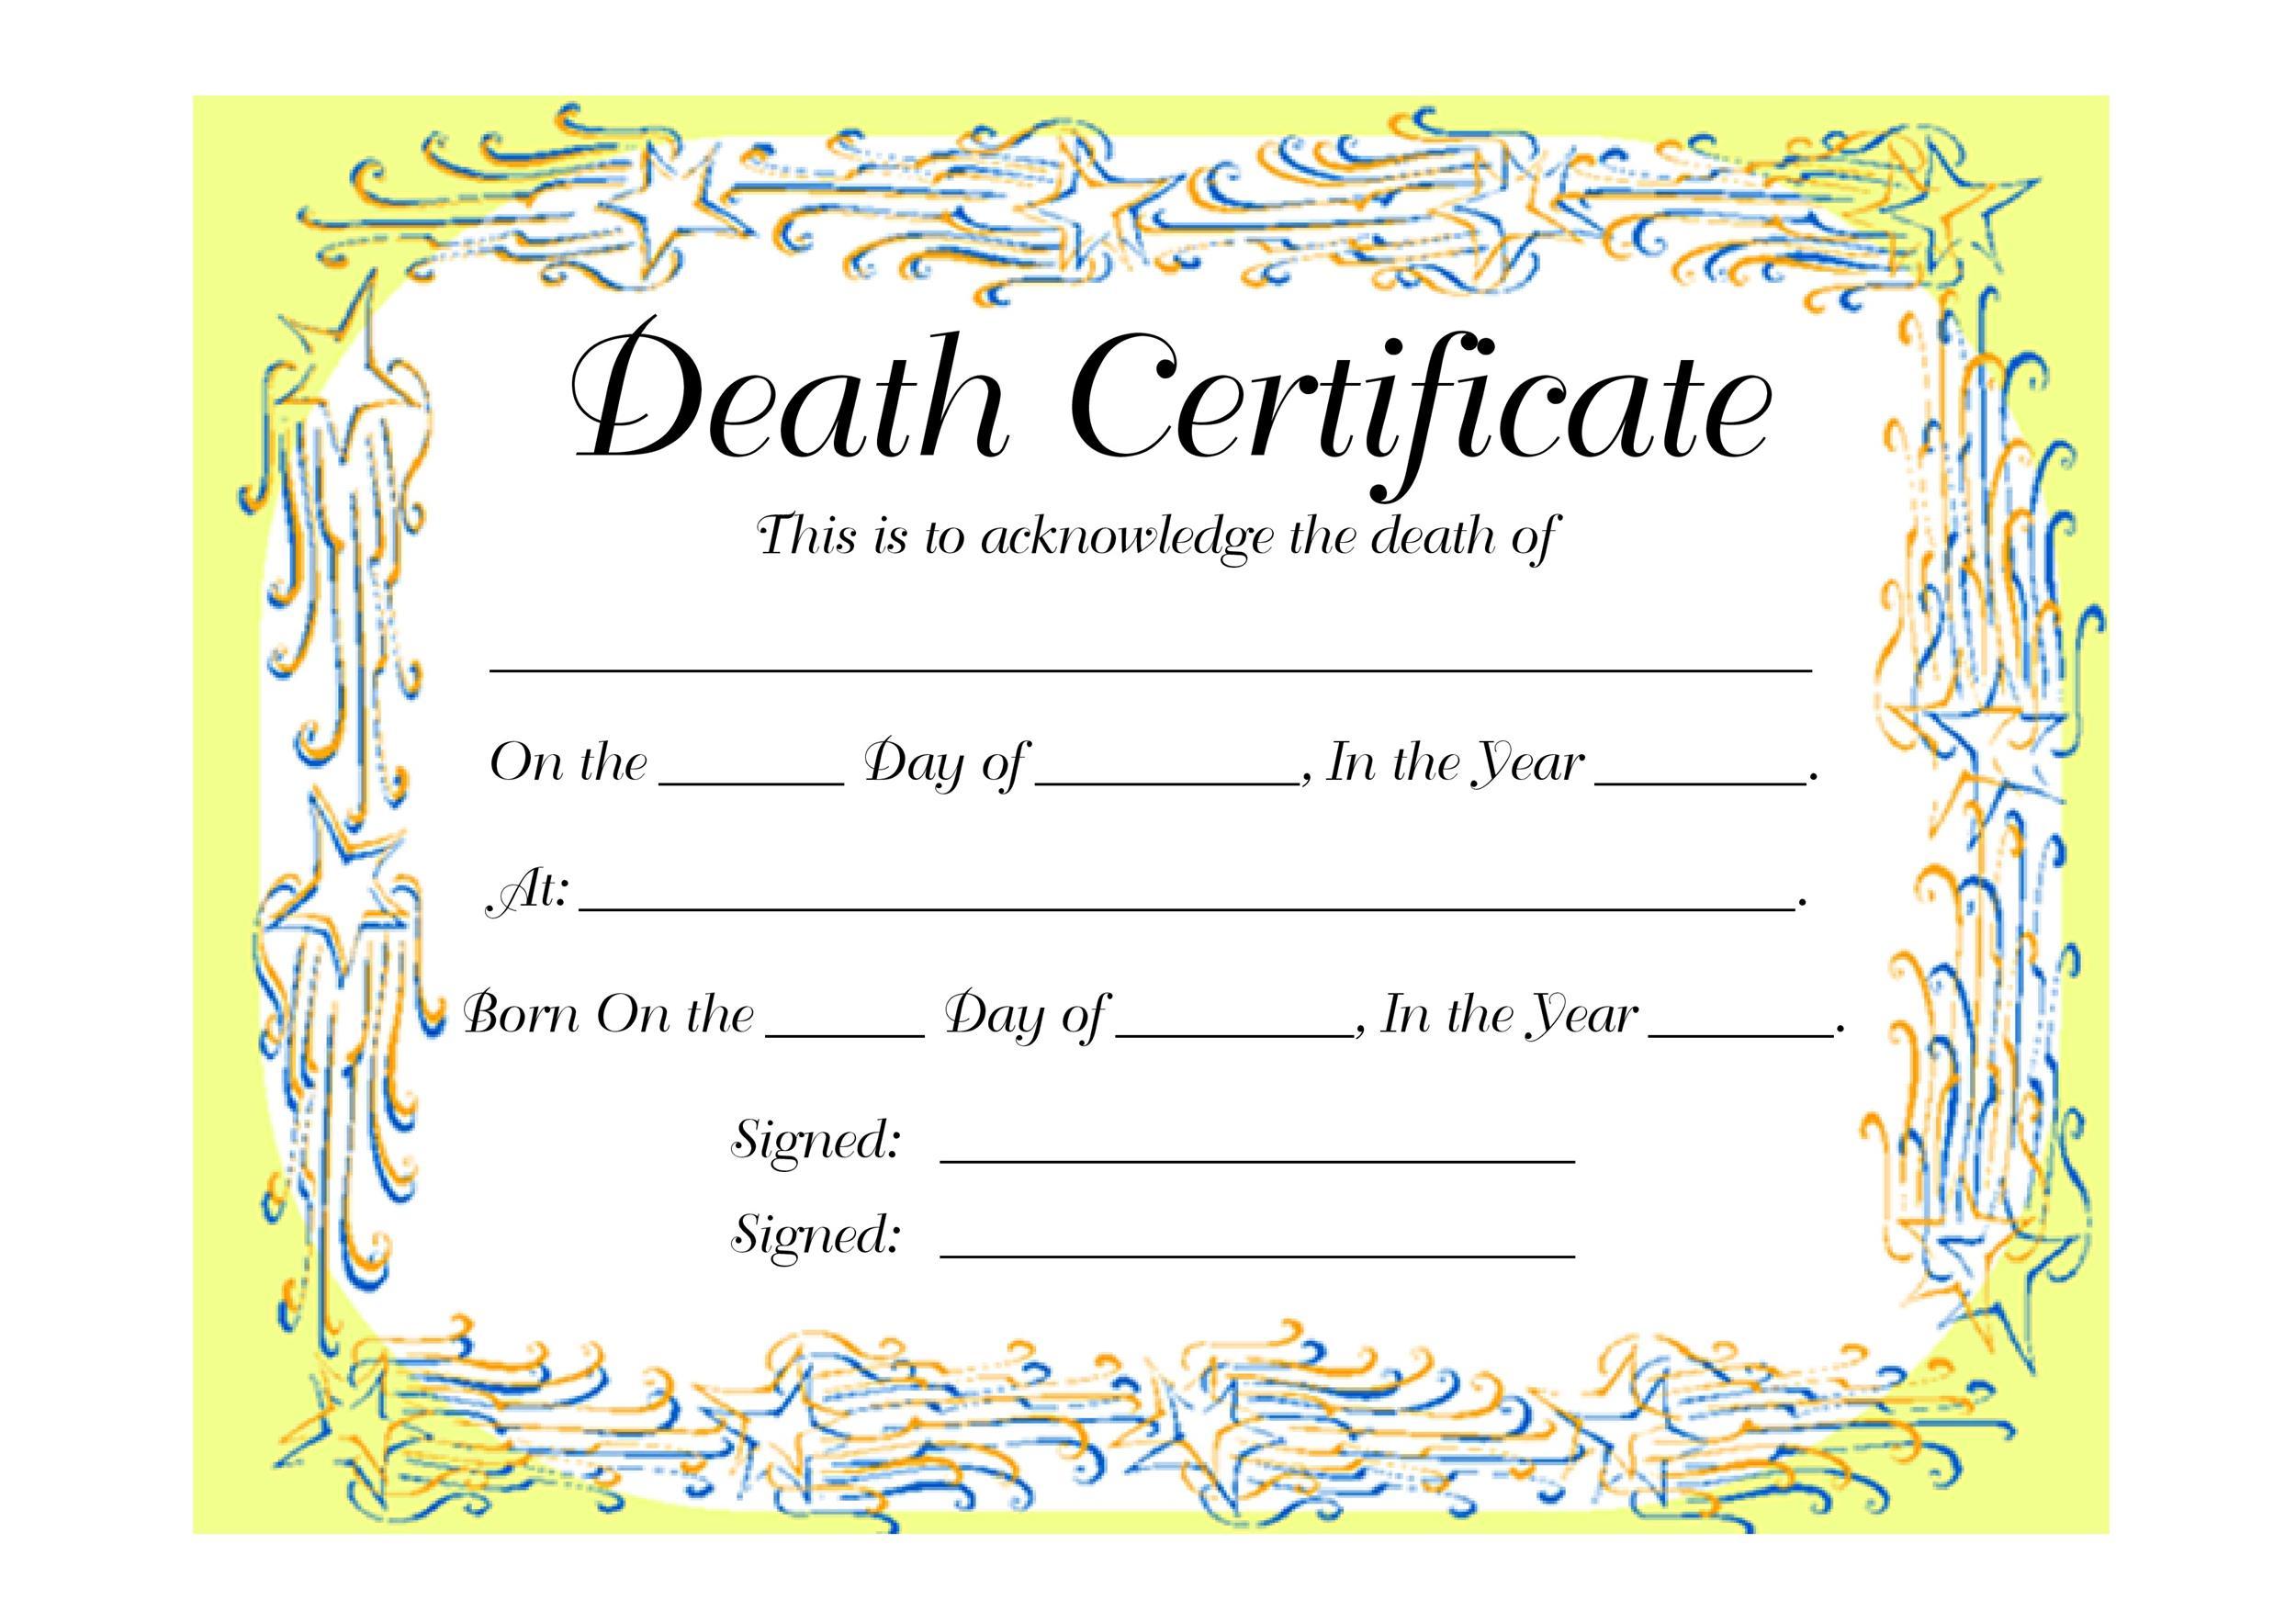 Free death certificate template 36